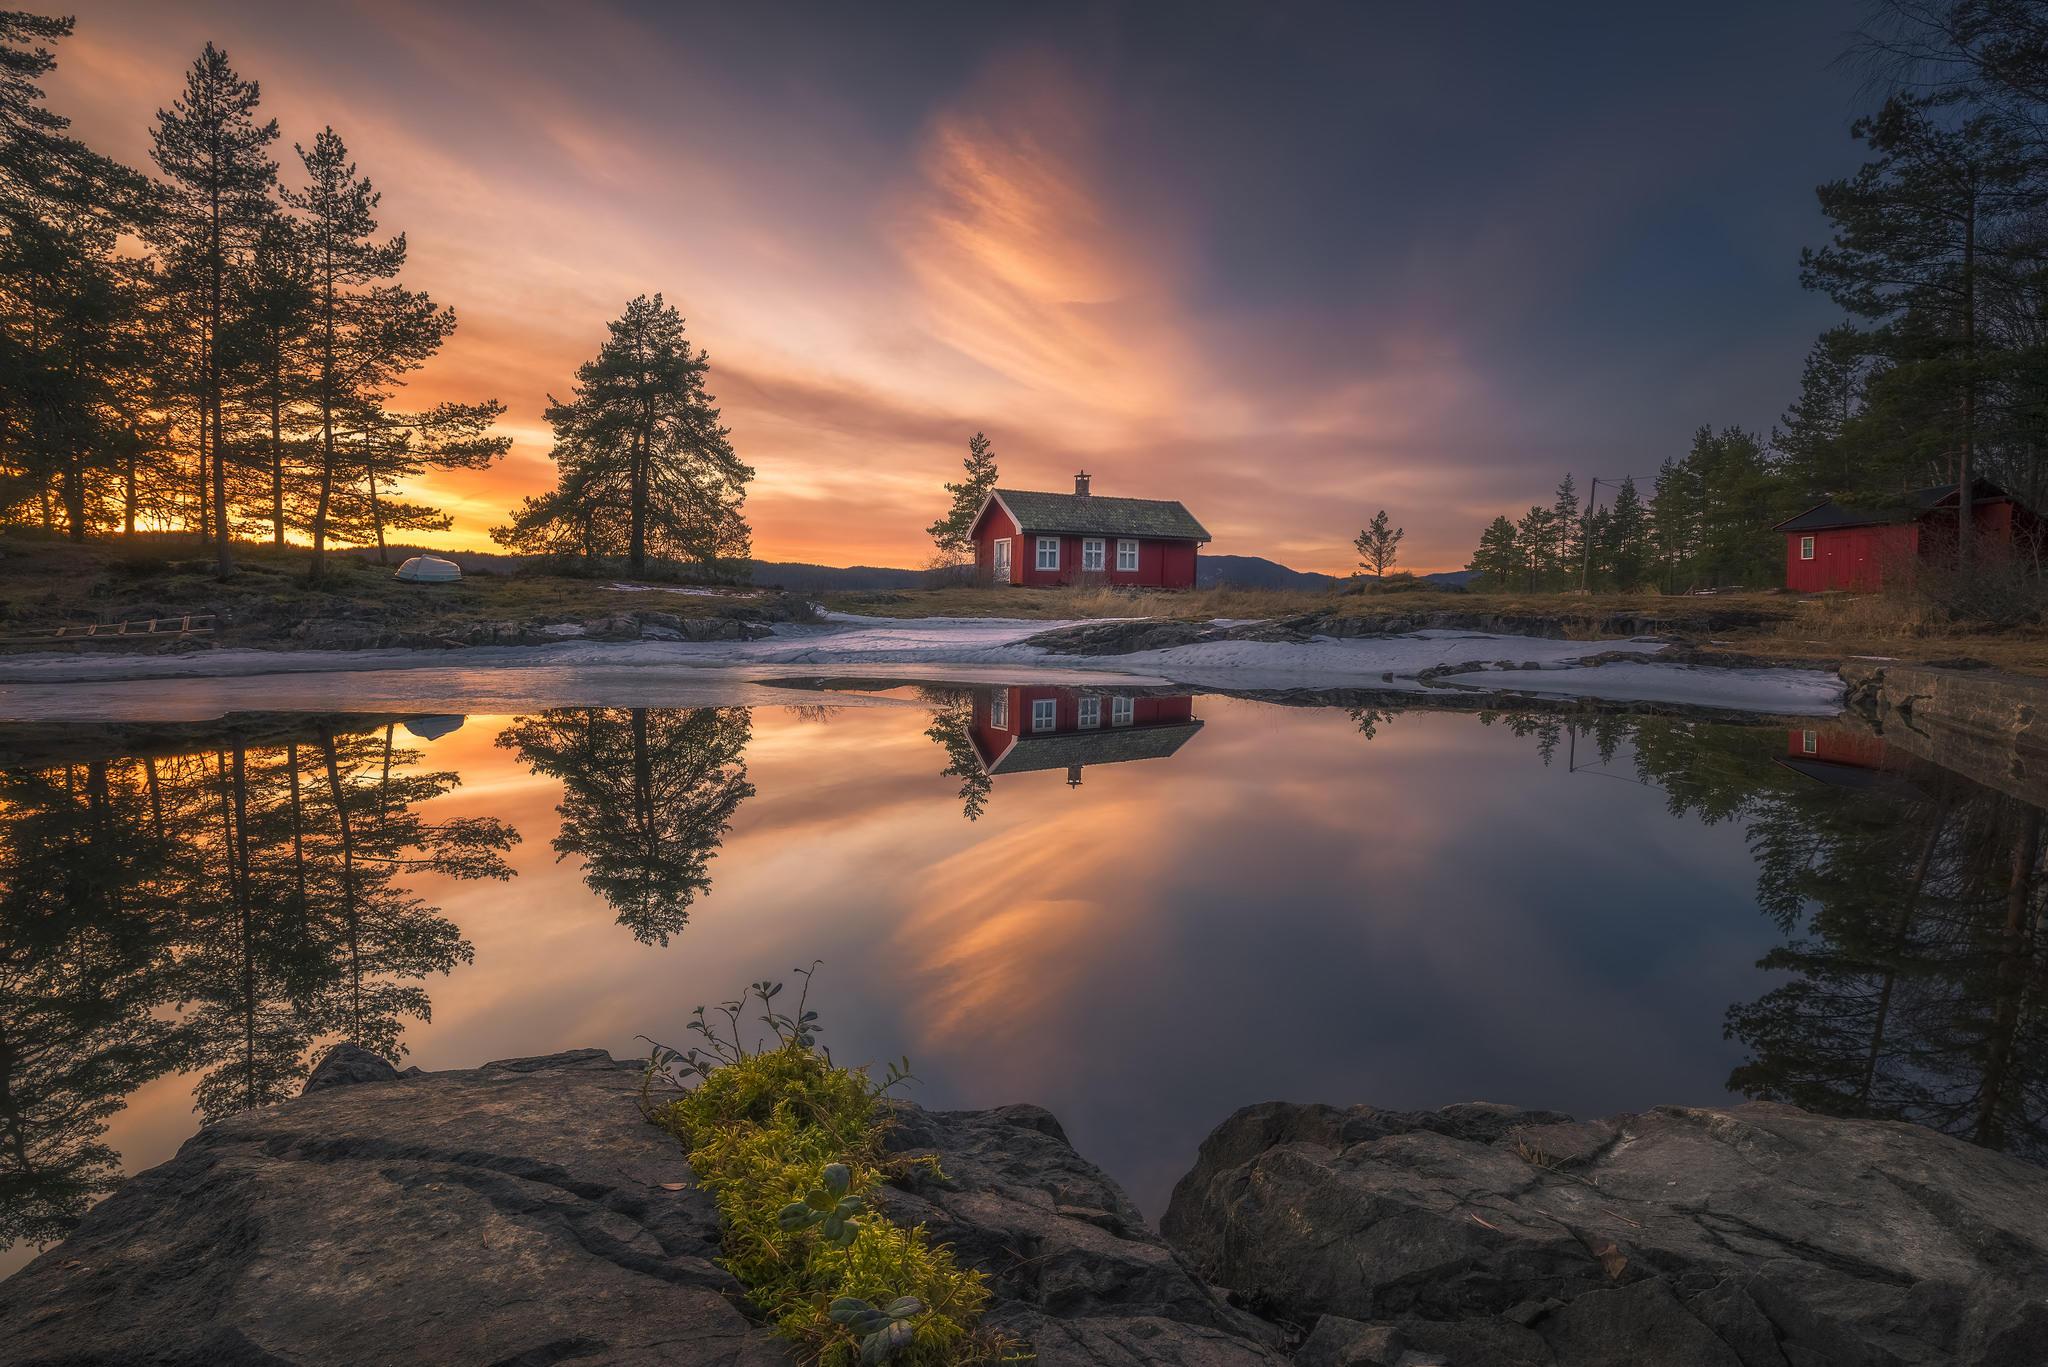 Sunset, Ringerike, Norway